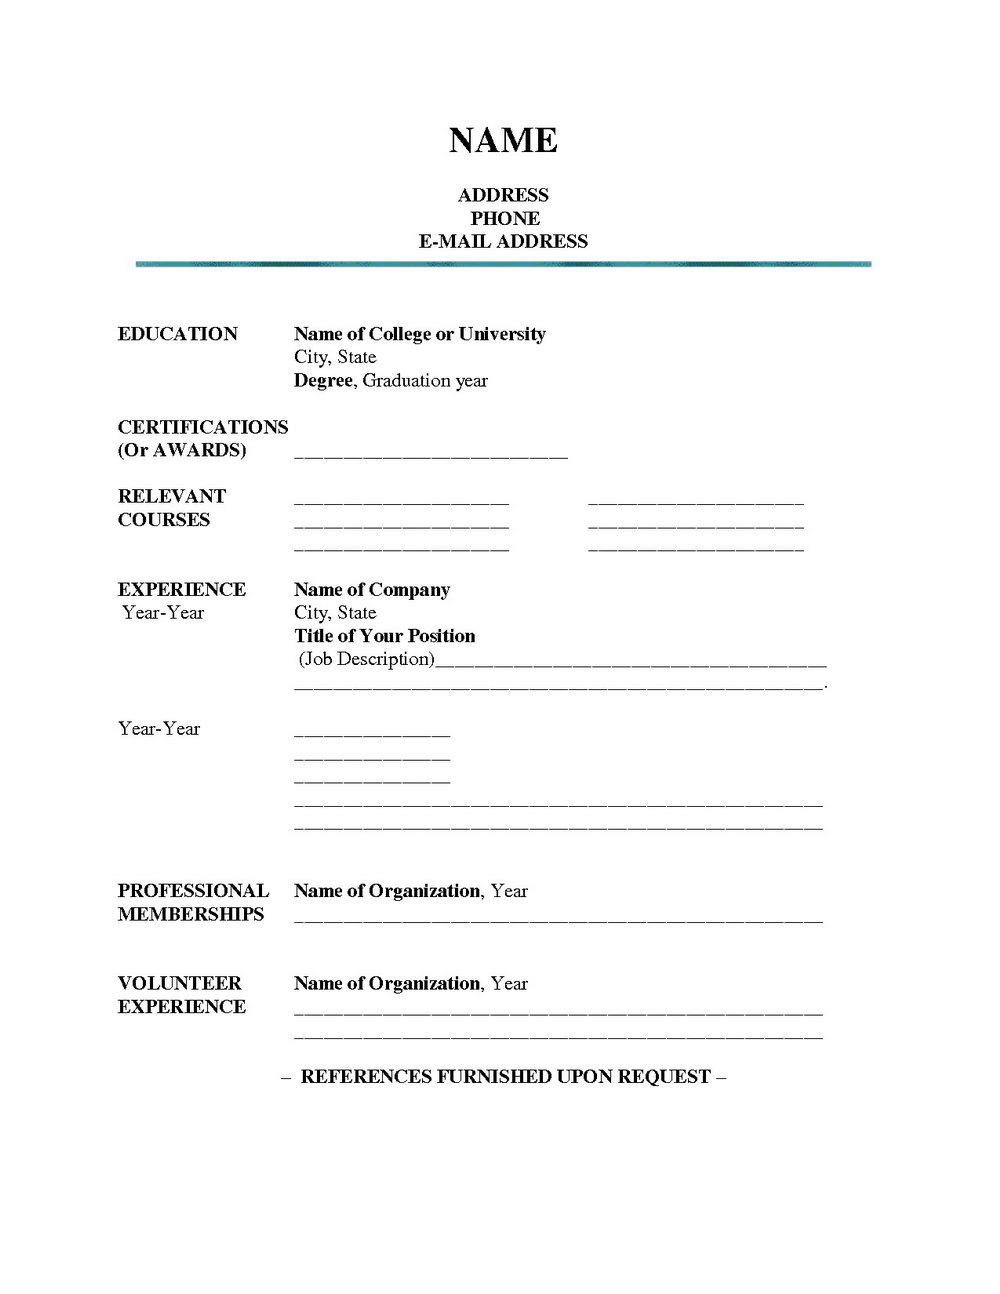 Blank Resume Format Download Pdf